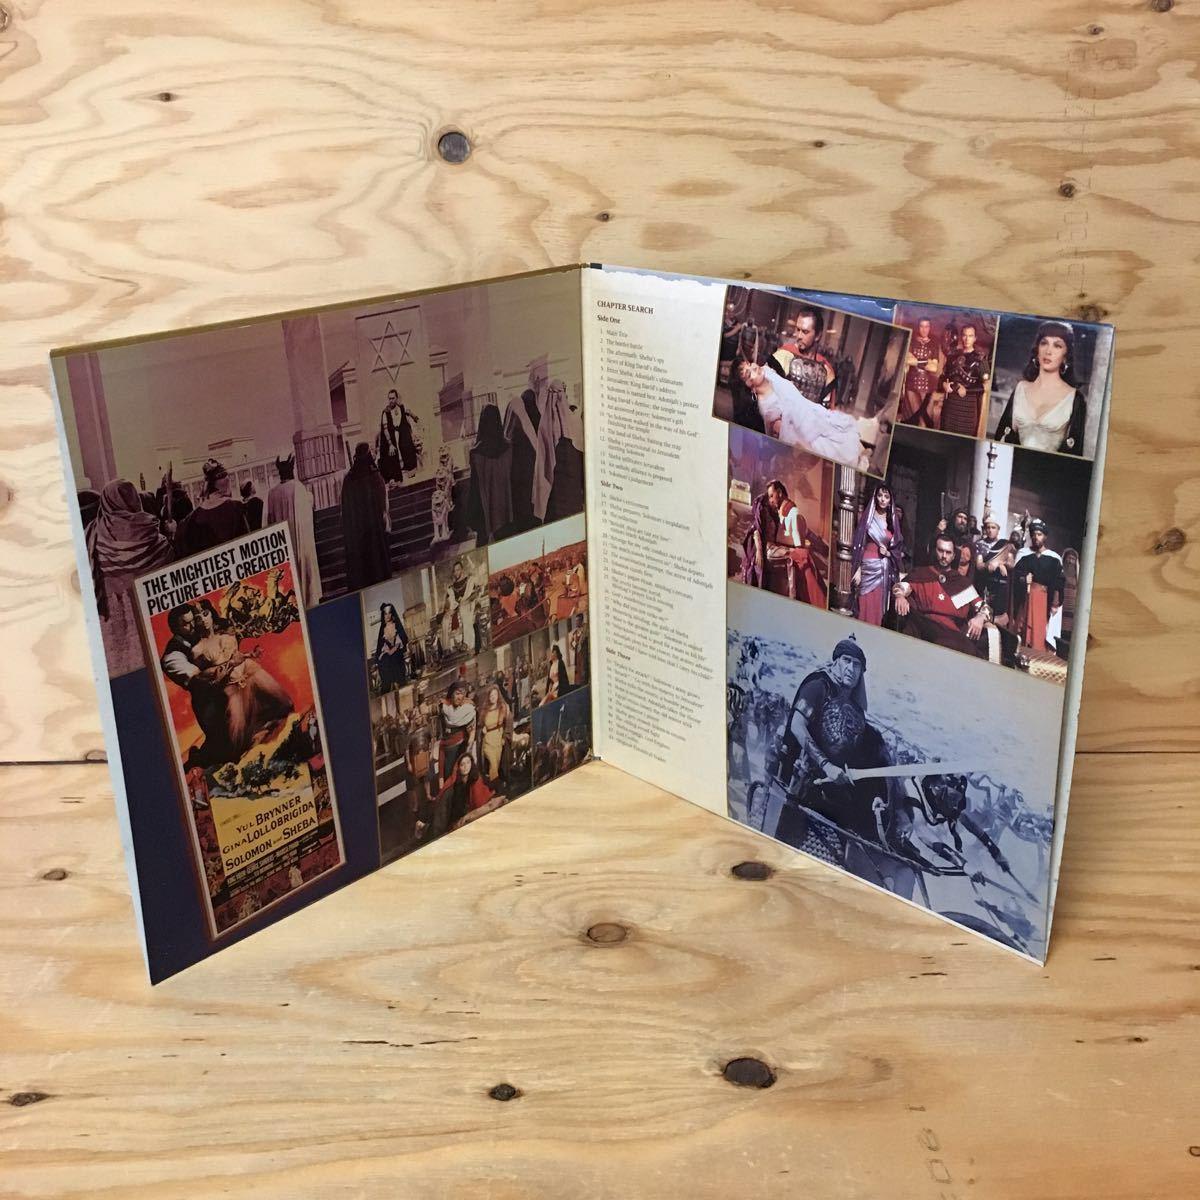 ◎Y3FIIC-200302 レア[SOLOMON and SHEBA 輸入盤]LD レーザーディスク YUL BRYNNER KING VIDOR_画像4